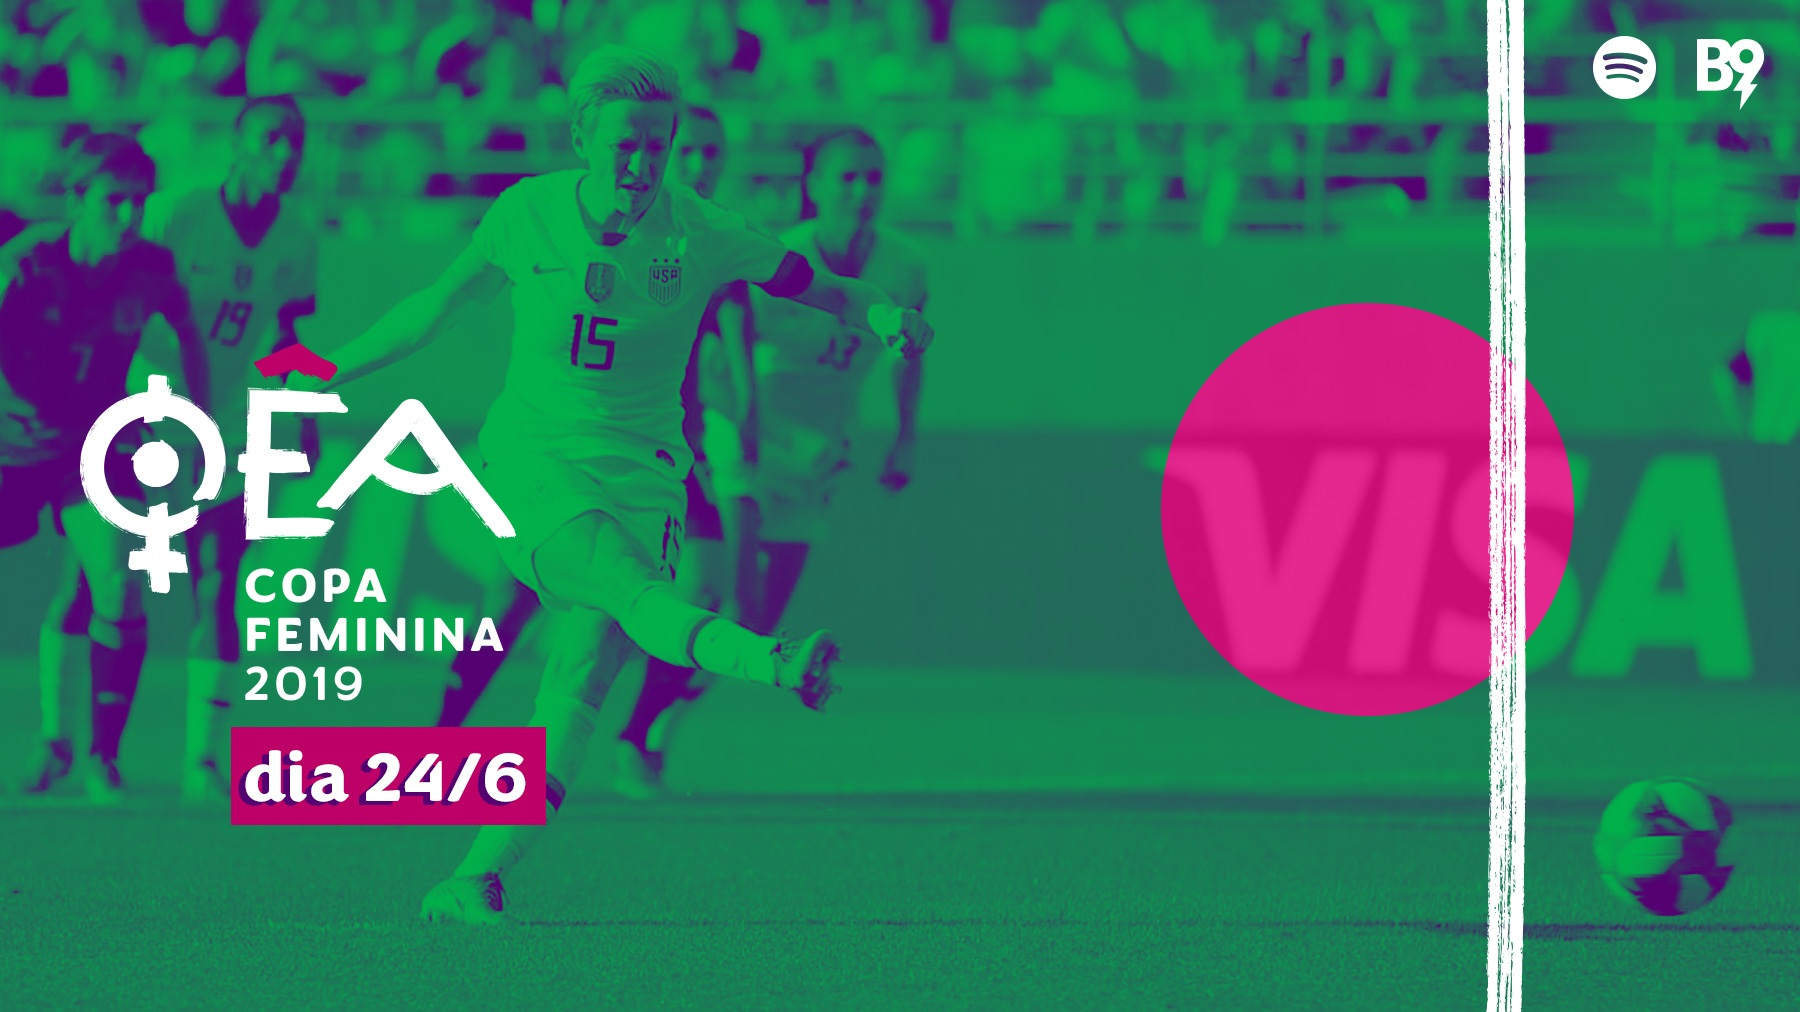 Oêa: Copa 2019 — 🇪🇸 1-2 🇺🇸 / 🇸🇪 1-0 🇨🇦